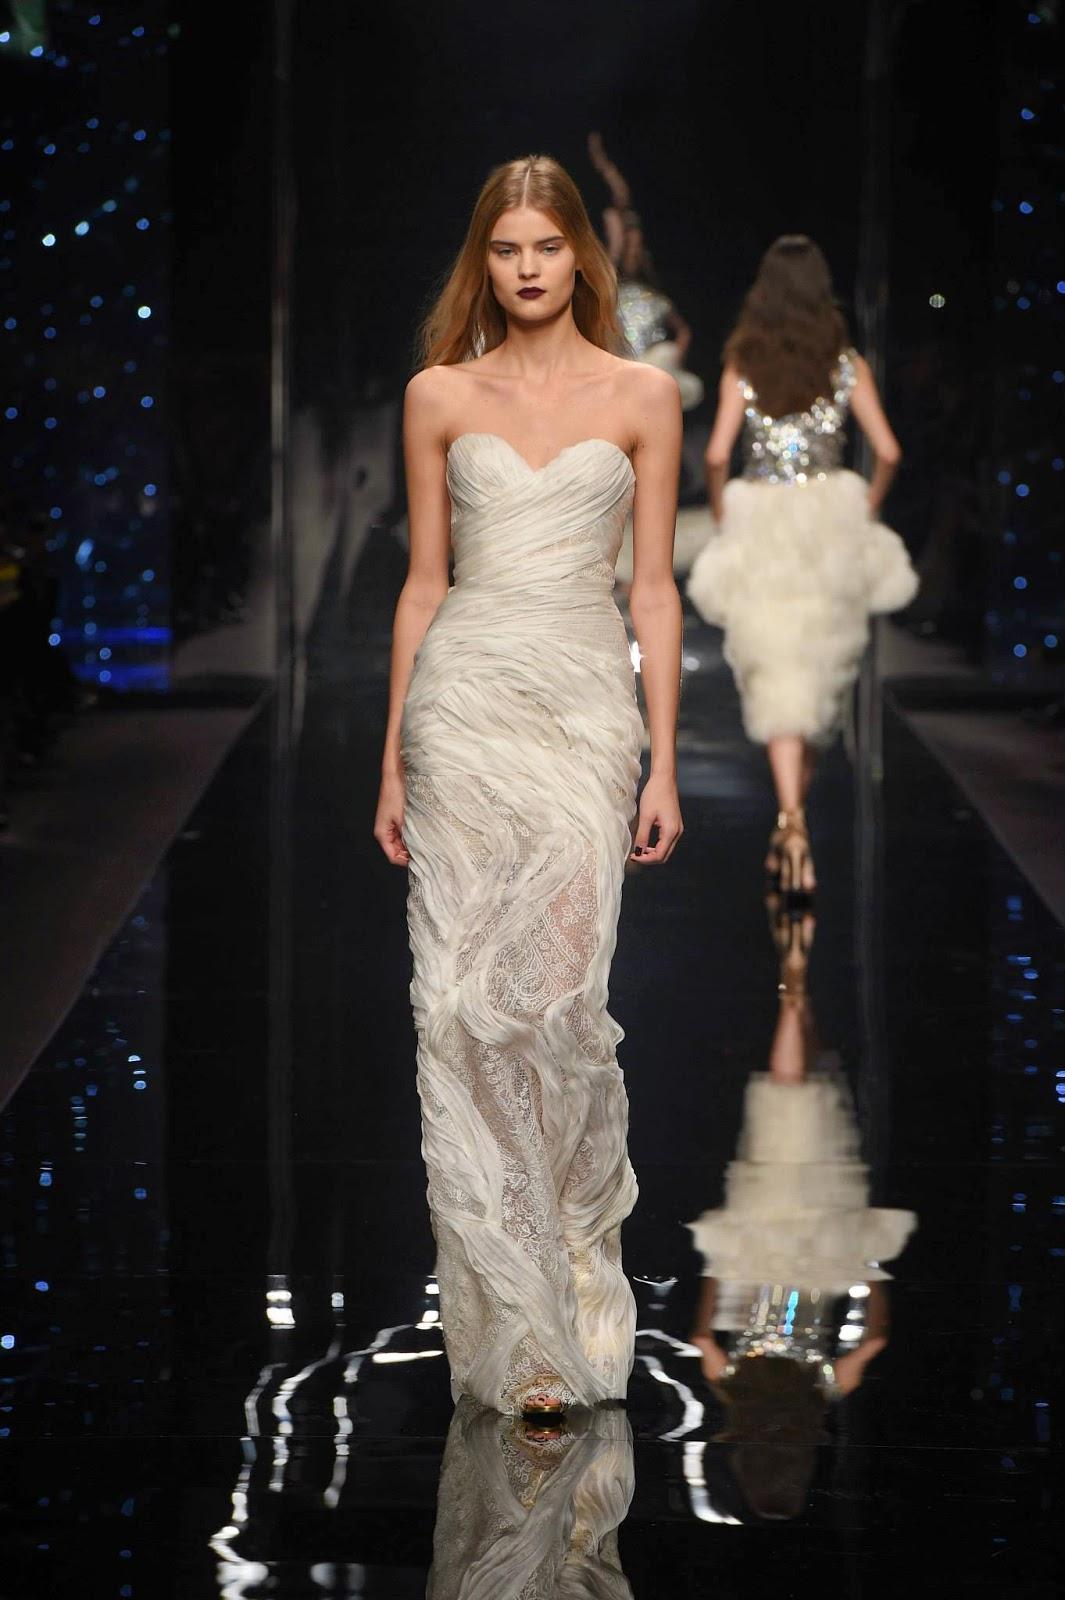 Concierge4fashion The Most Beautiful Girl In The World: Concierge4Fashion: Ermanno Scervino Women's Fall Winter